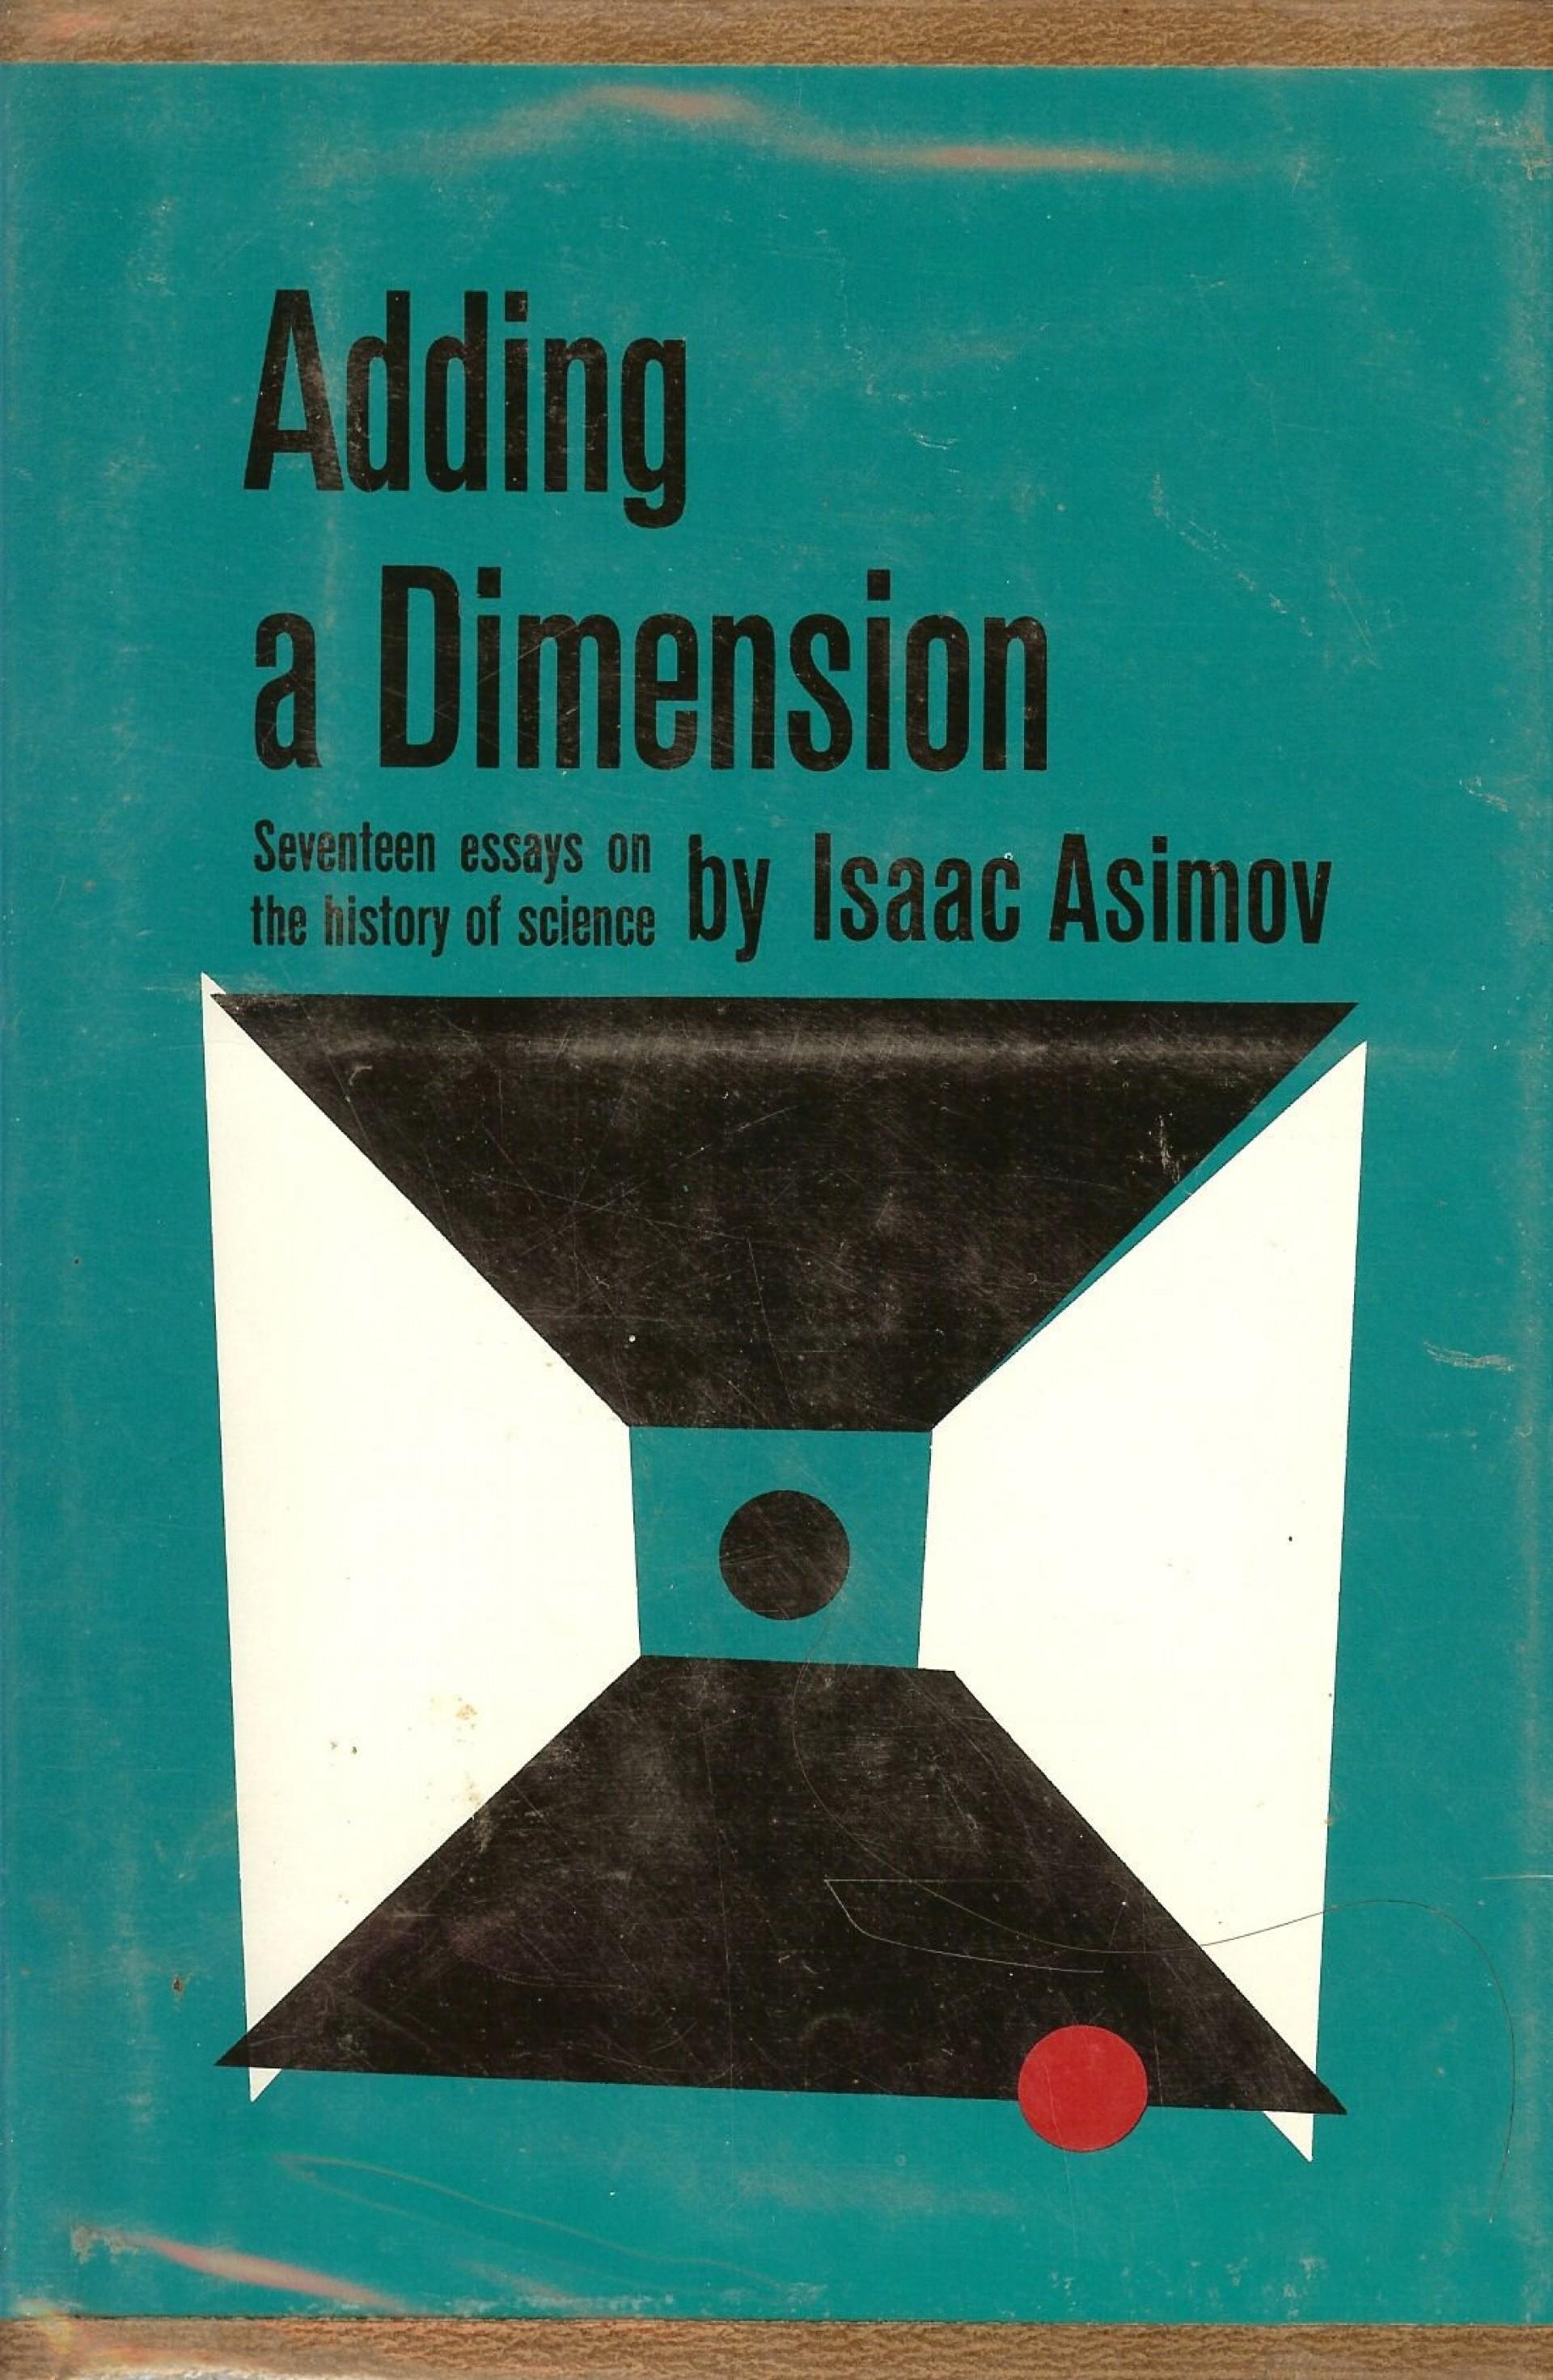 003 Essay Example 810n2jdah2bl Isaac Asimov Awful Essays On Creativity Intelligence 1920